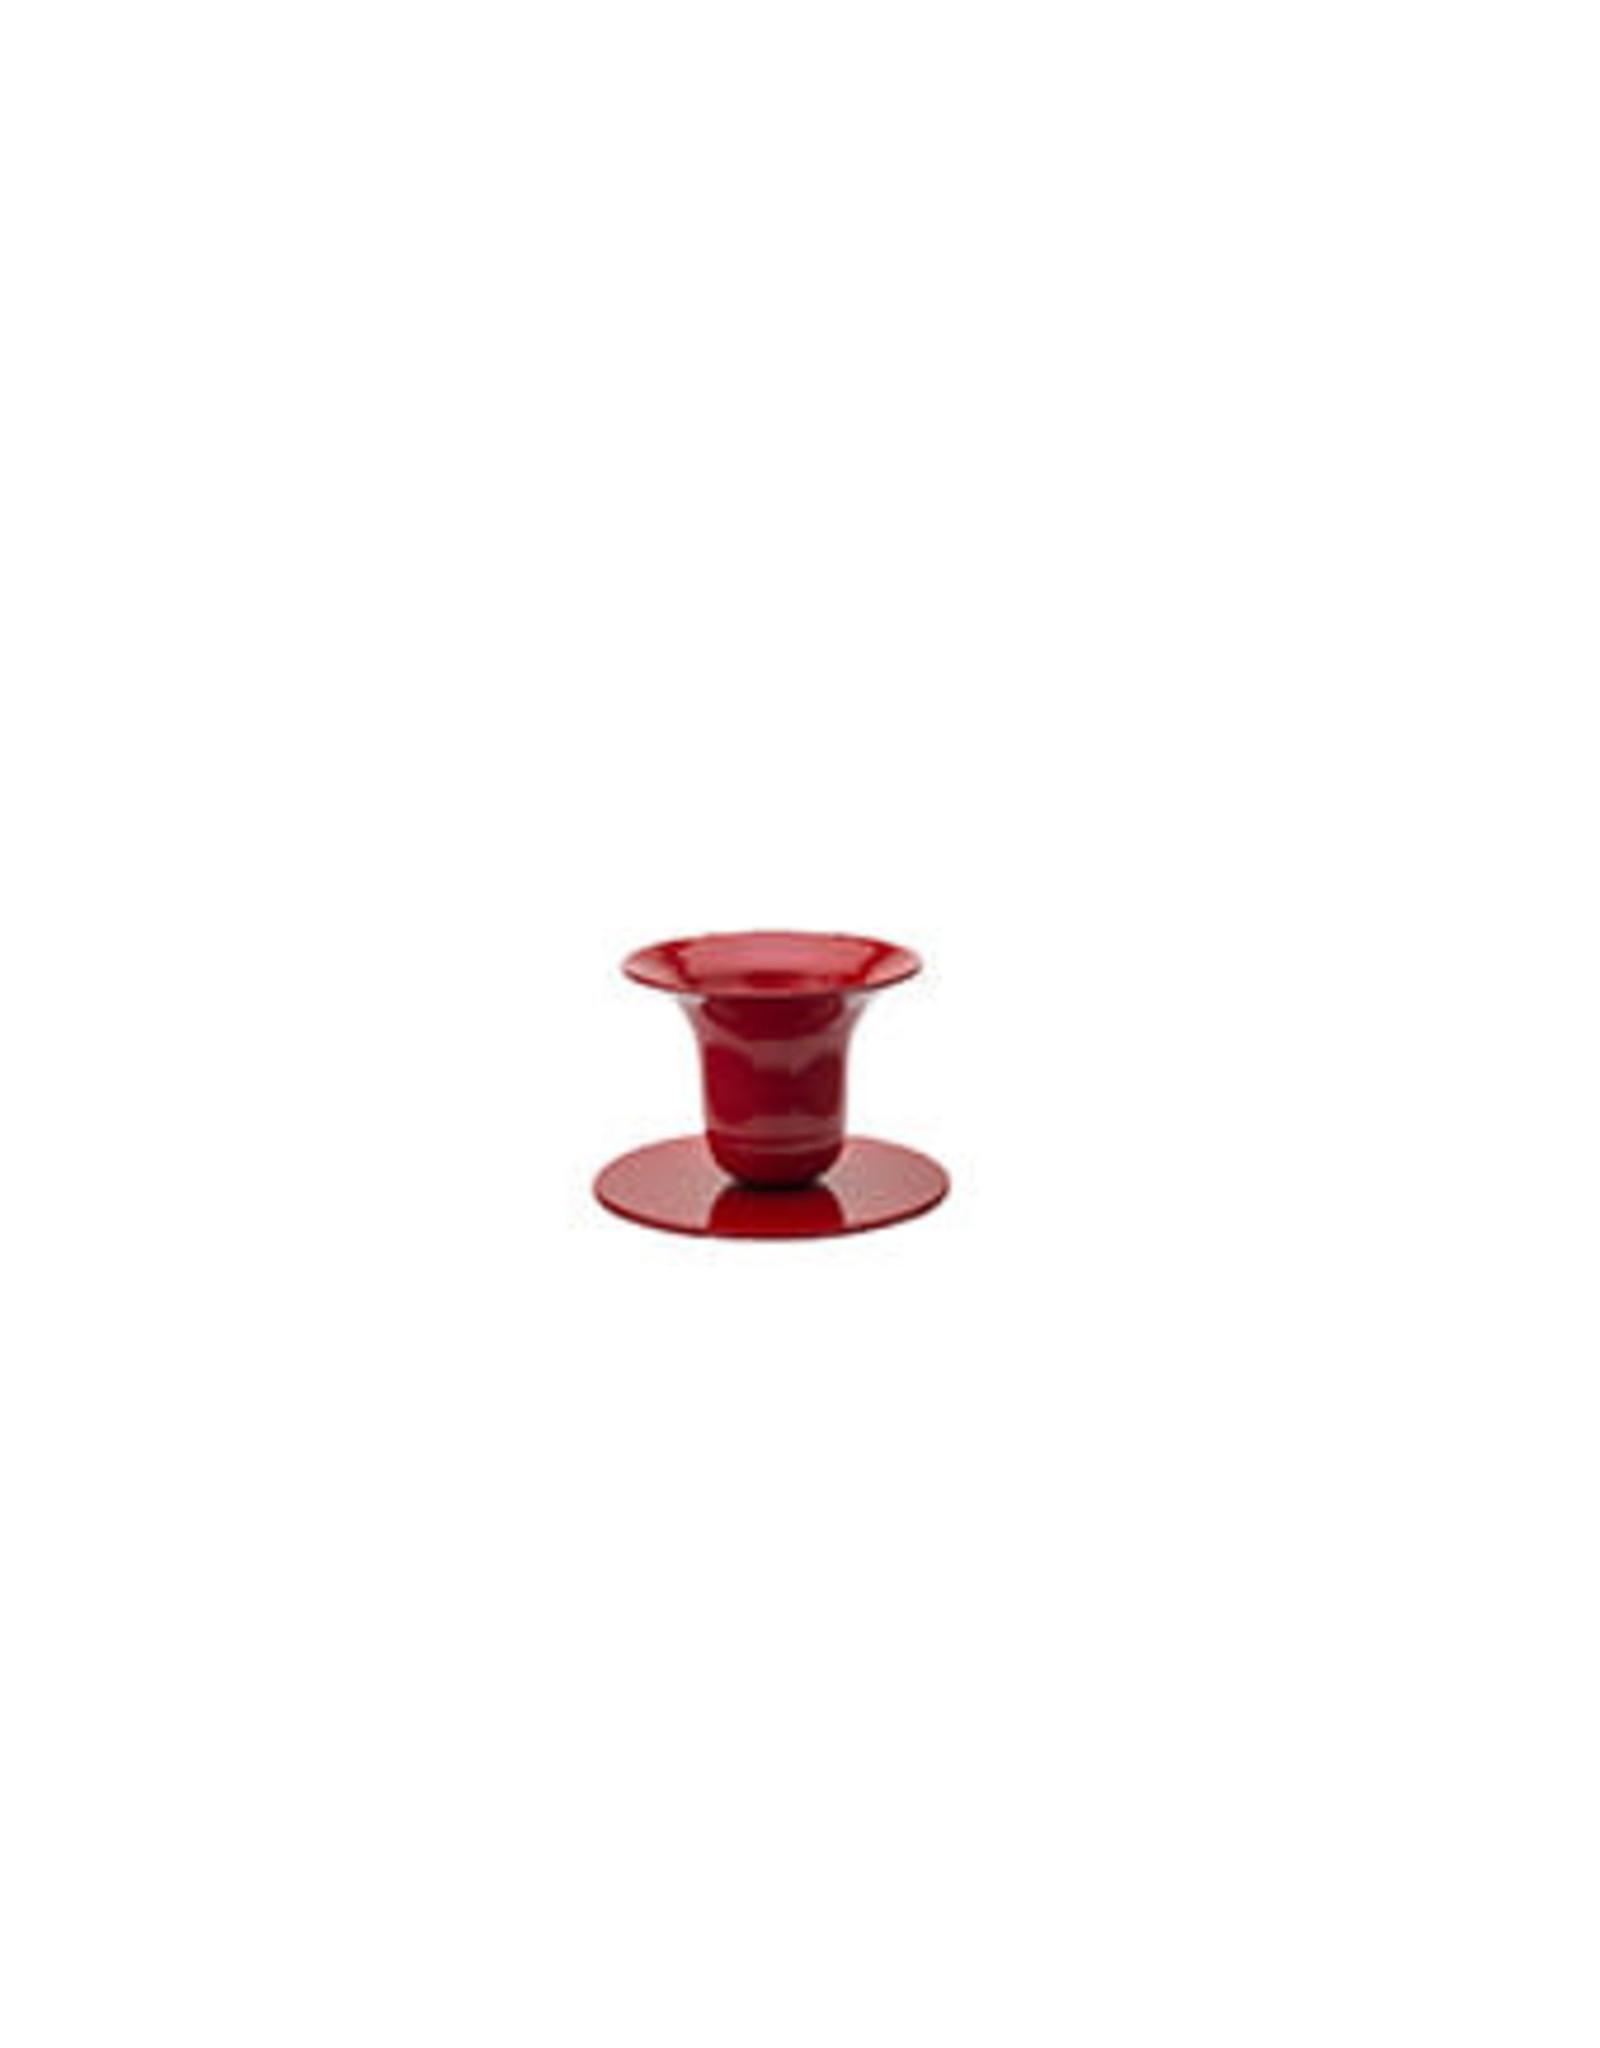 Kunst industrien Kandelaar, Bel - Red    H 5cm Ø 2,3cm